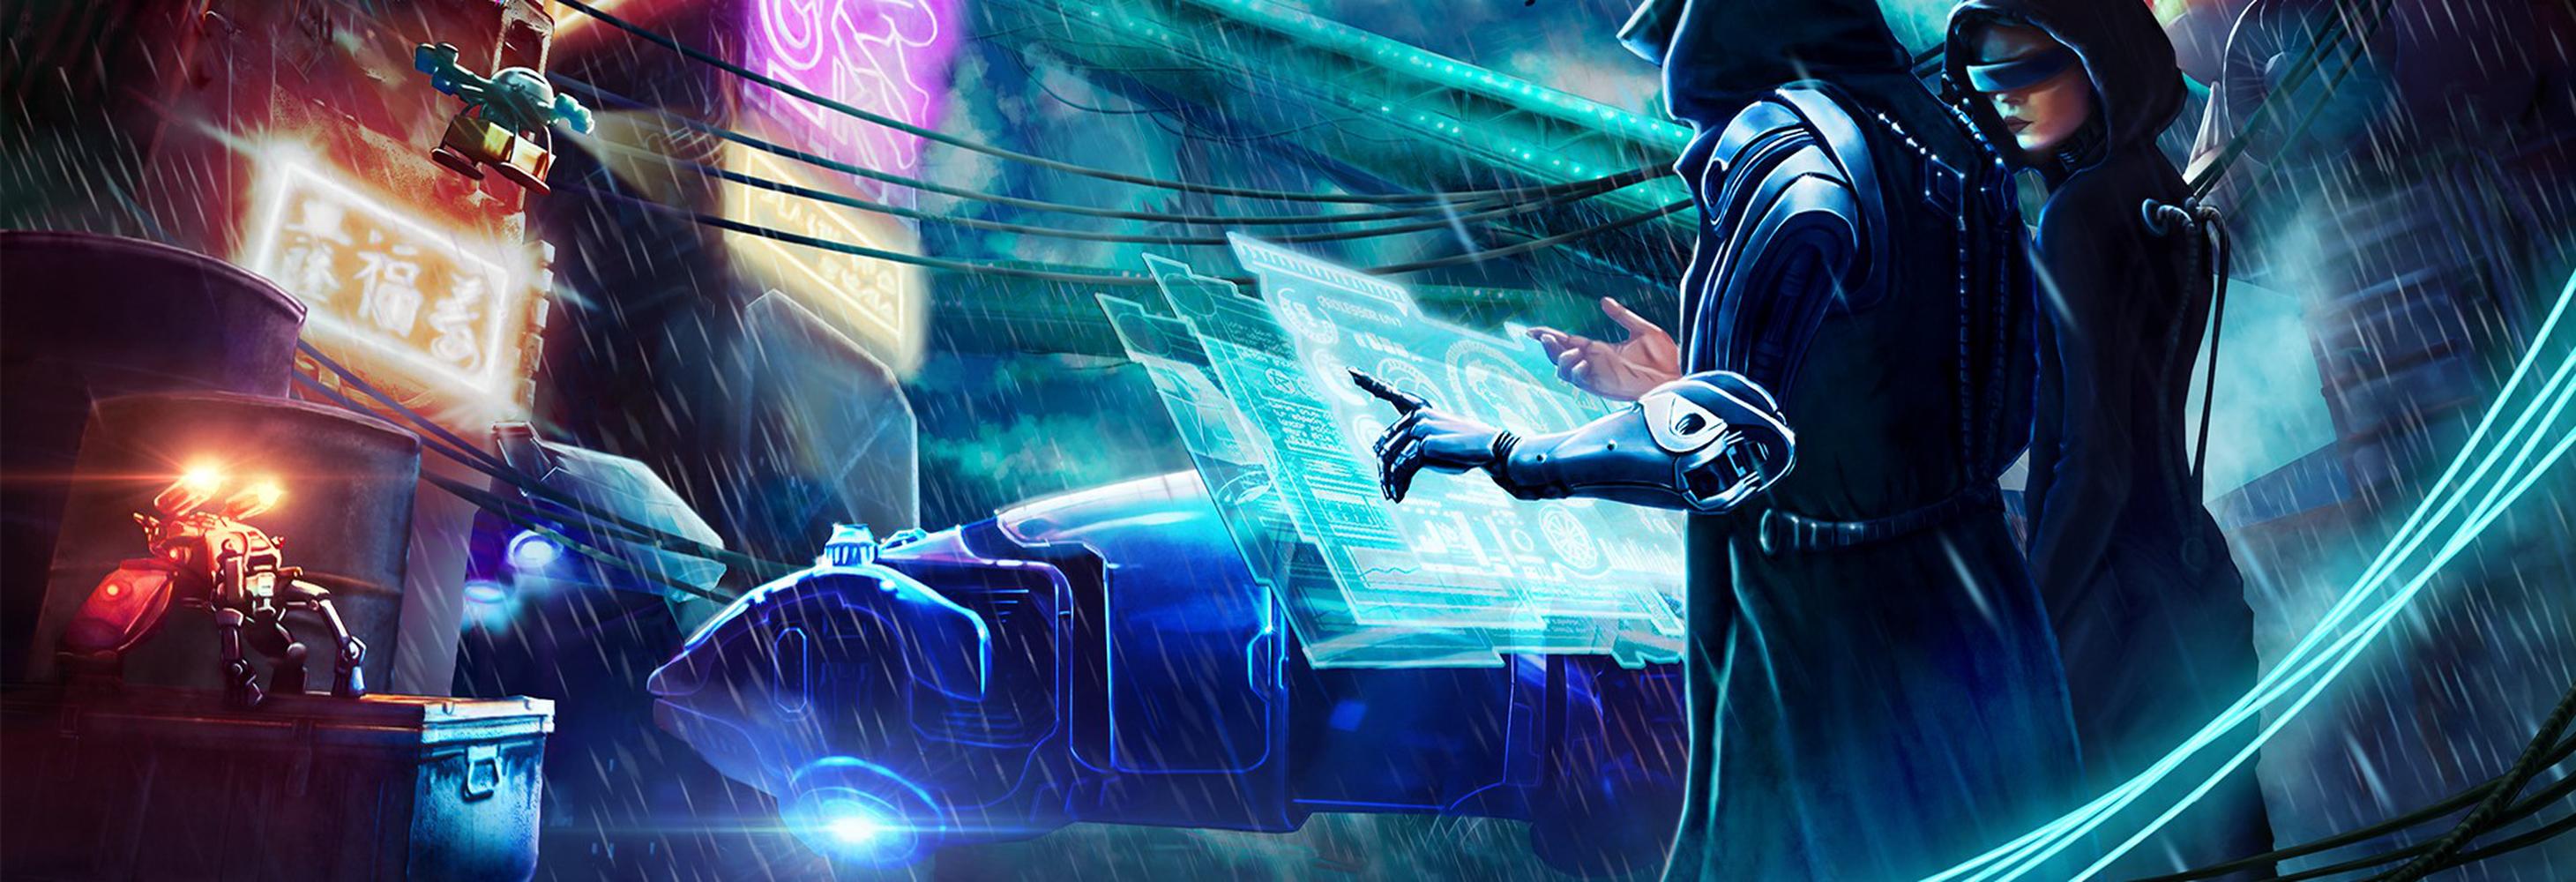 Фотография квеста «Cyberpunk»